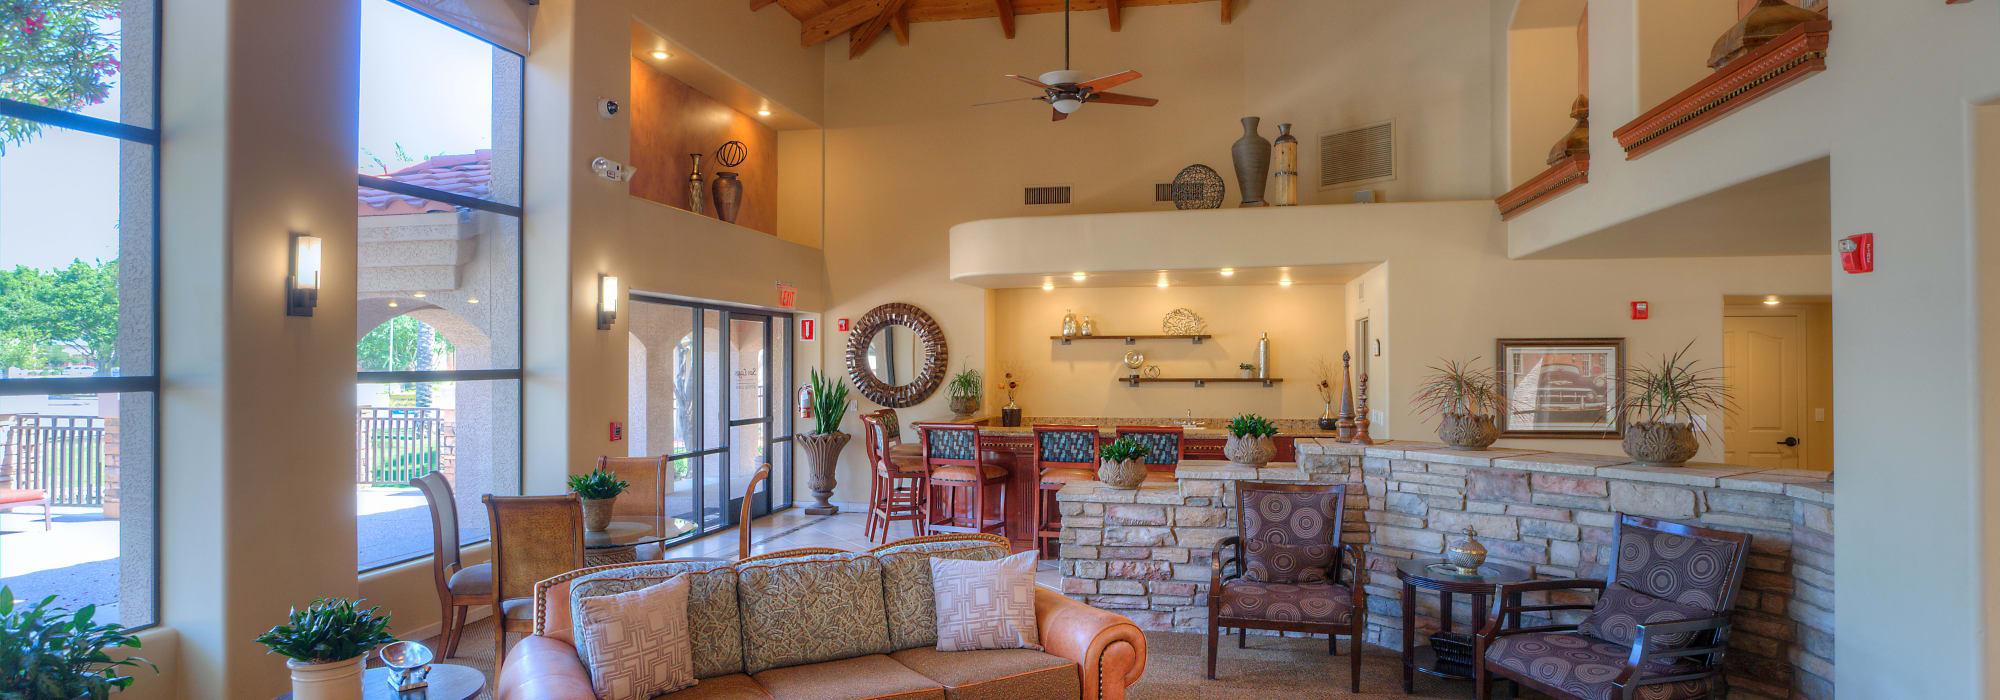 Large resident clubhouse at San Lagos in Glendale, Arizona